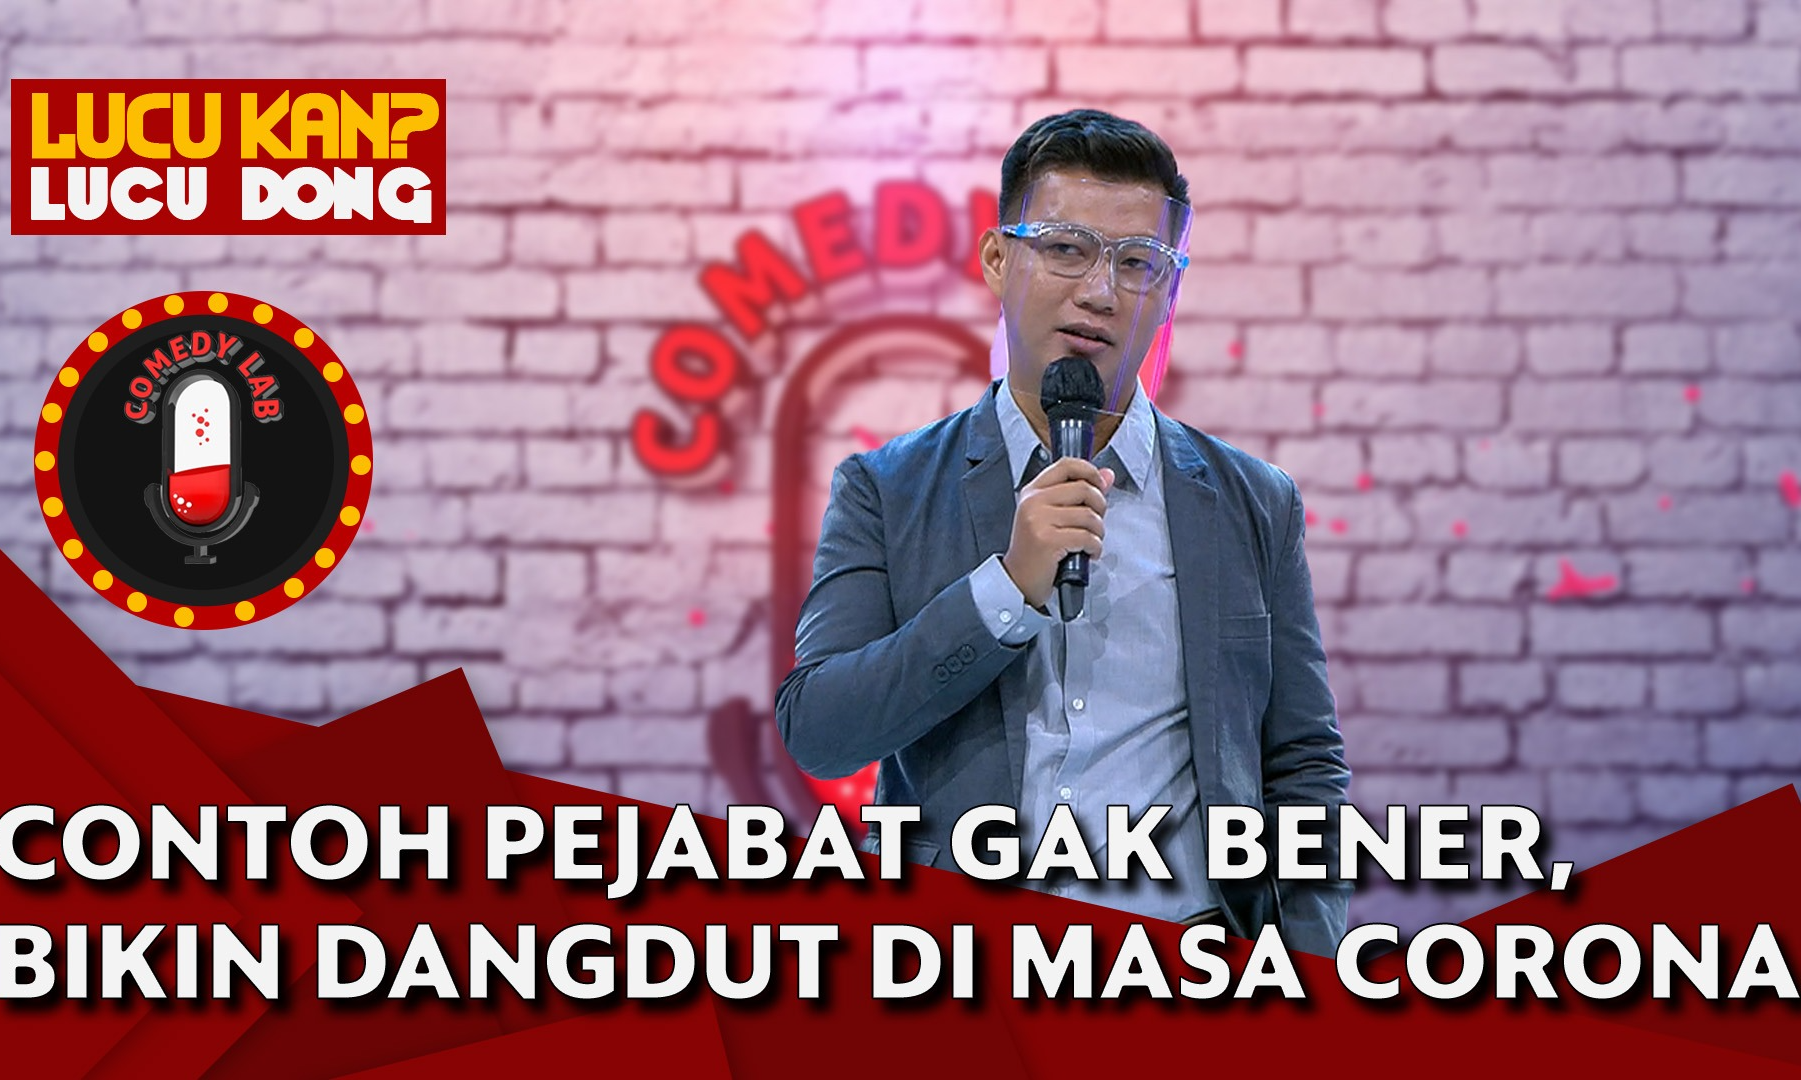 stand-up-david-nurbianto-pejabat-gak-bener-bikin-dangdutan-di-masa-corona-comedy-lab-part-7